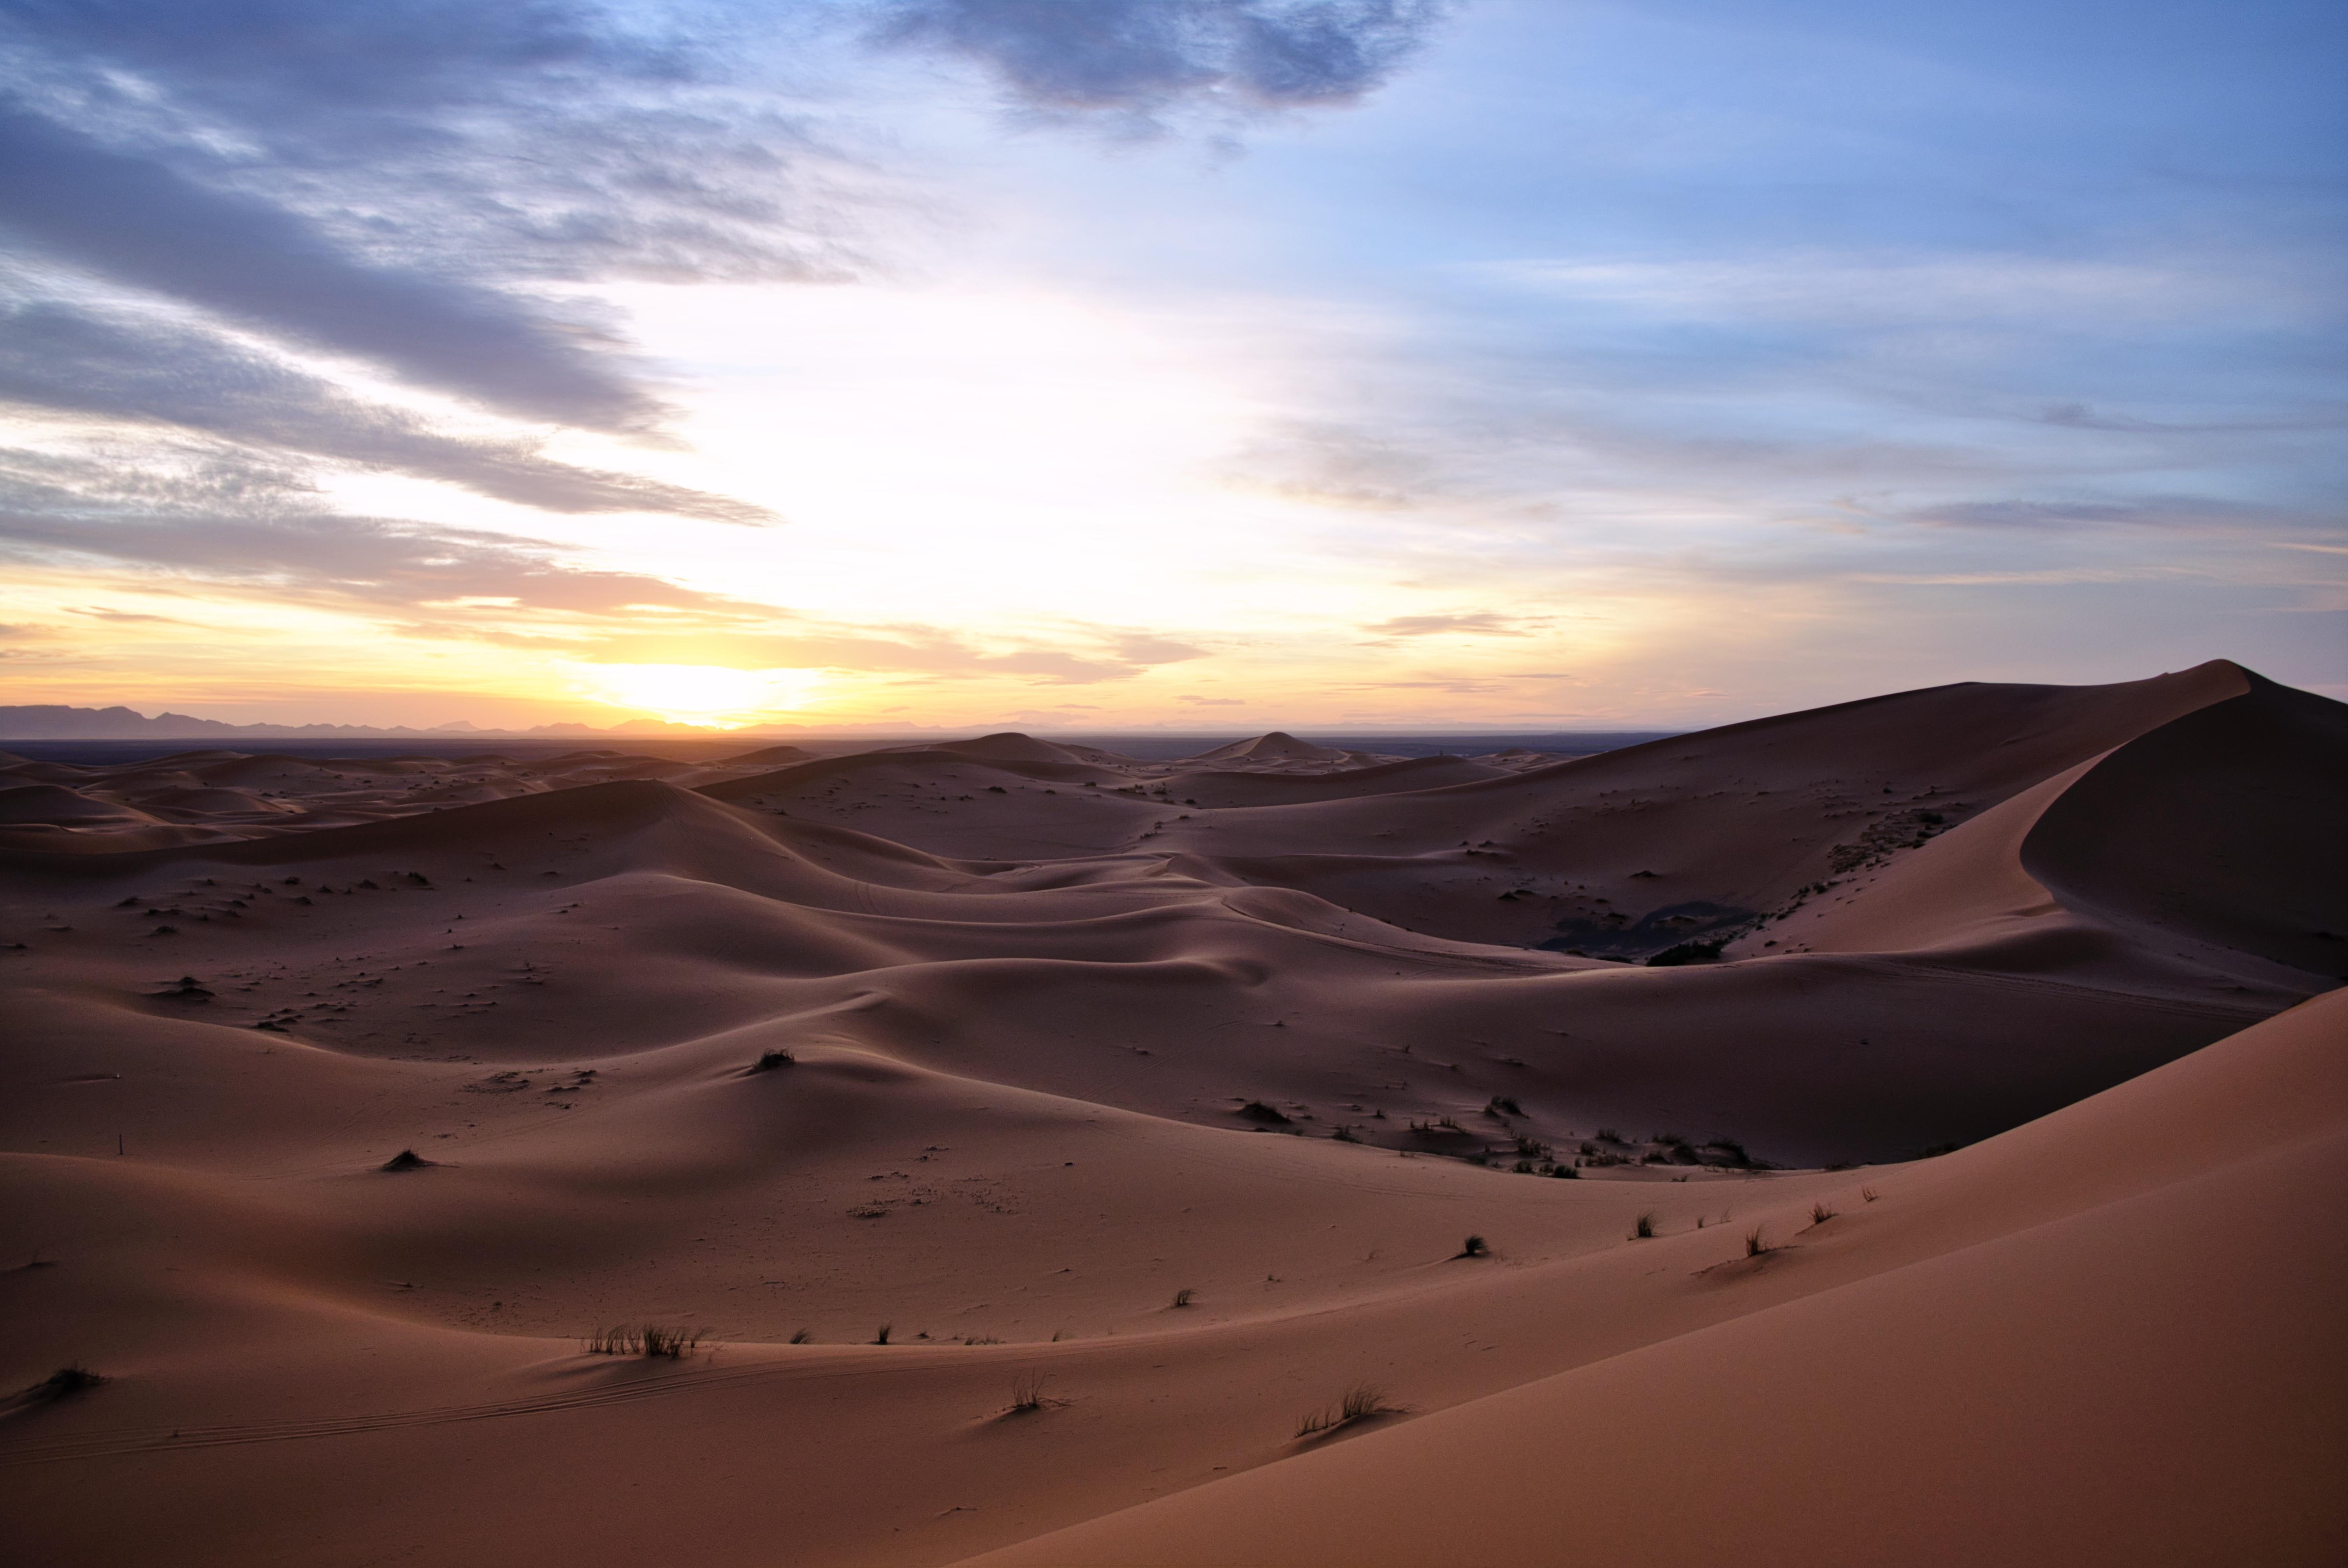 Marrakech tours– Dades Valley (3 days)